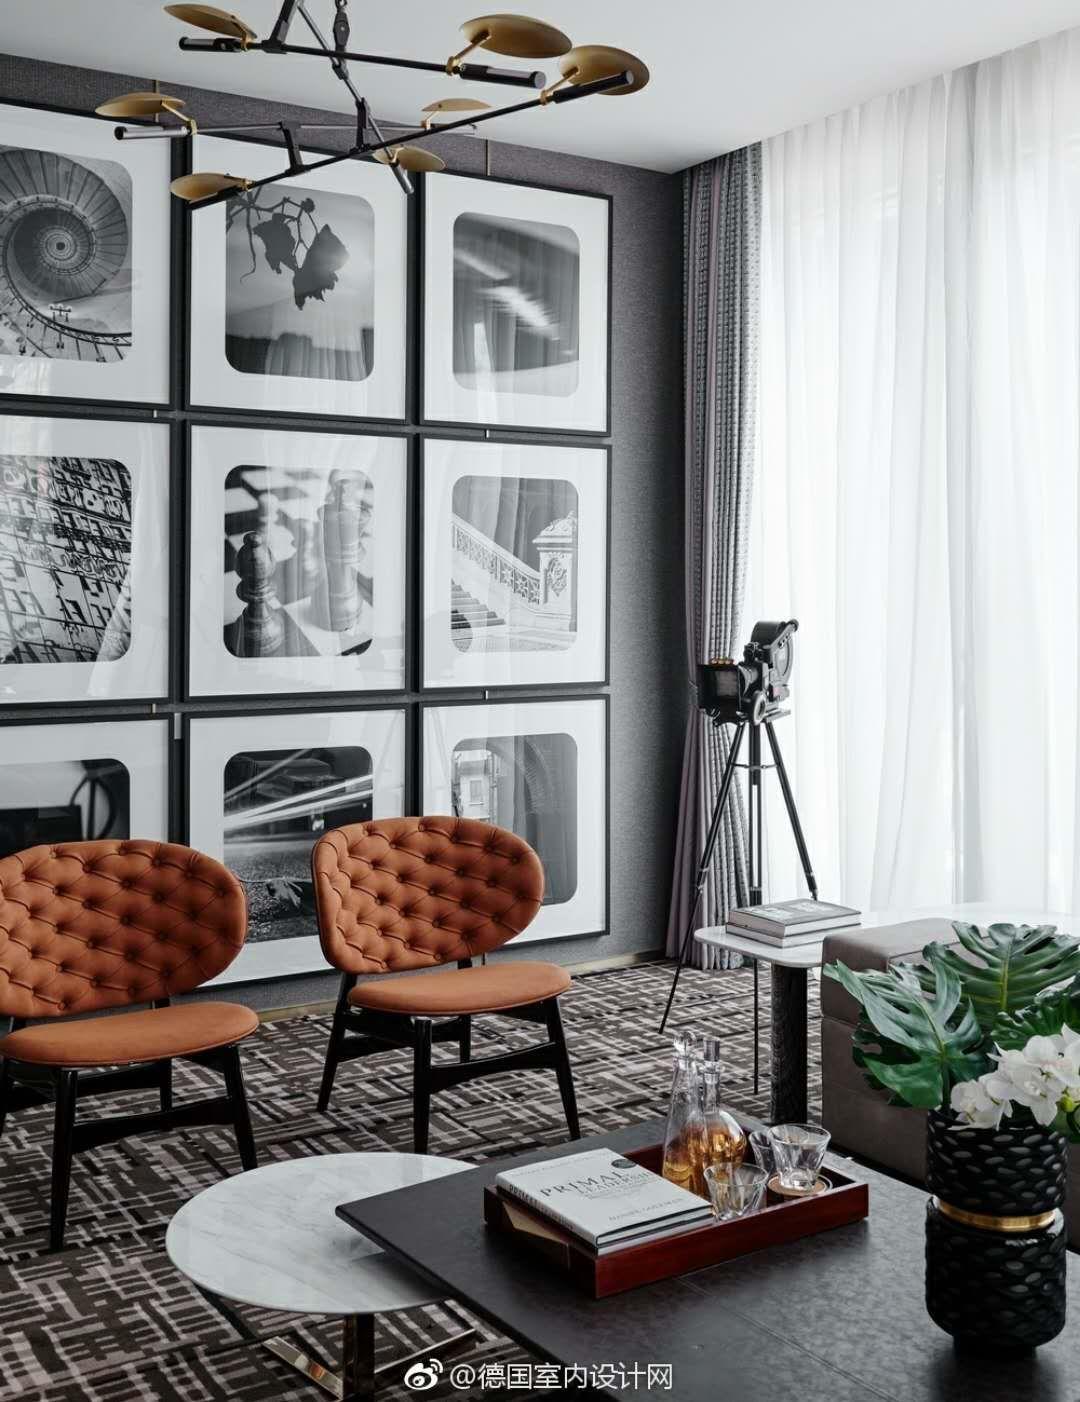 What Is Hot On Pinterest Mid Century Bedroom Ideas Retro Home